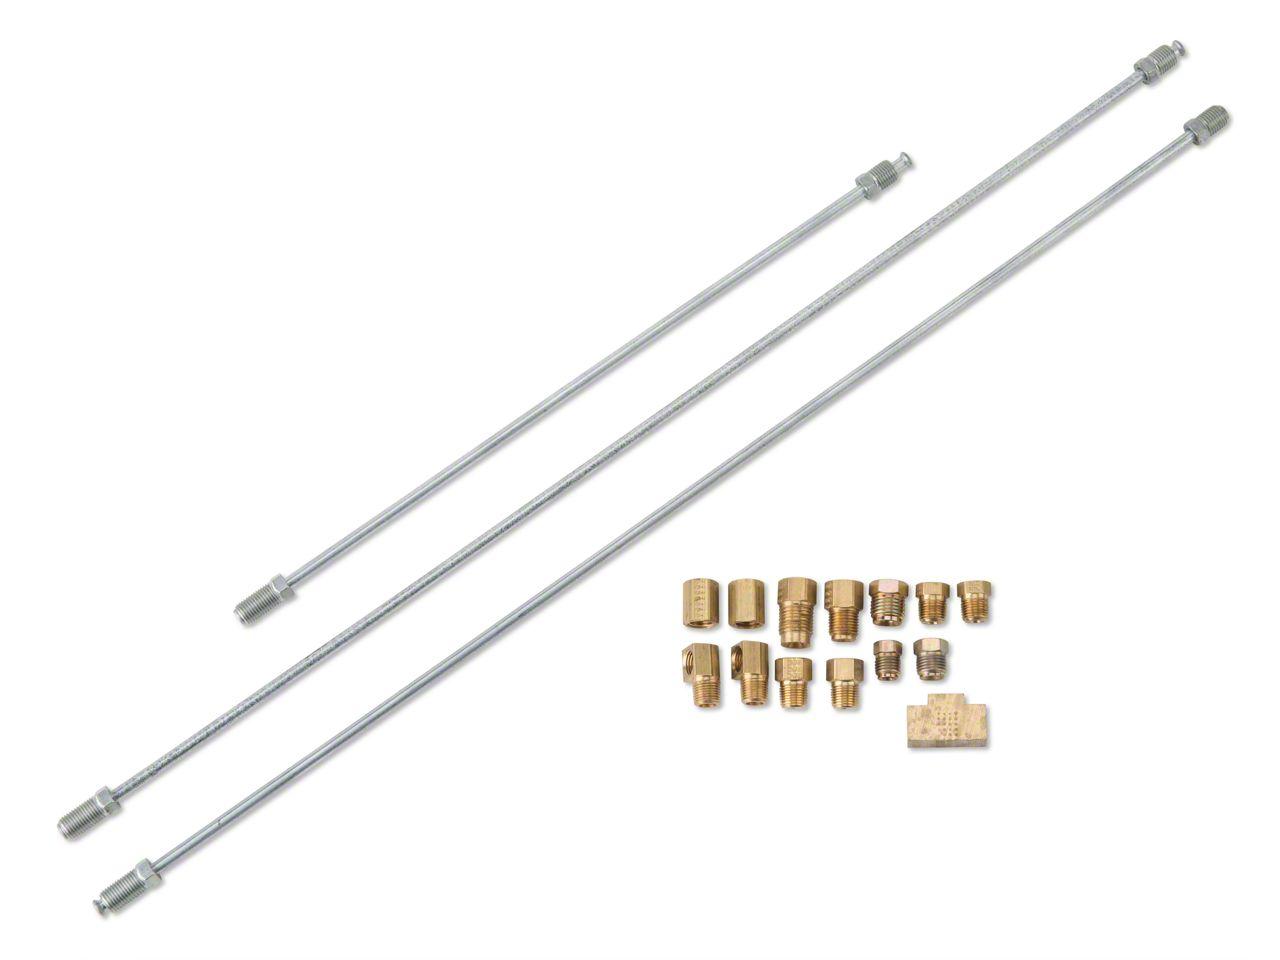 Hurst Mustang Line Lock Roll Control Kit 1745000 (79-04